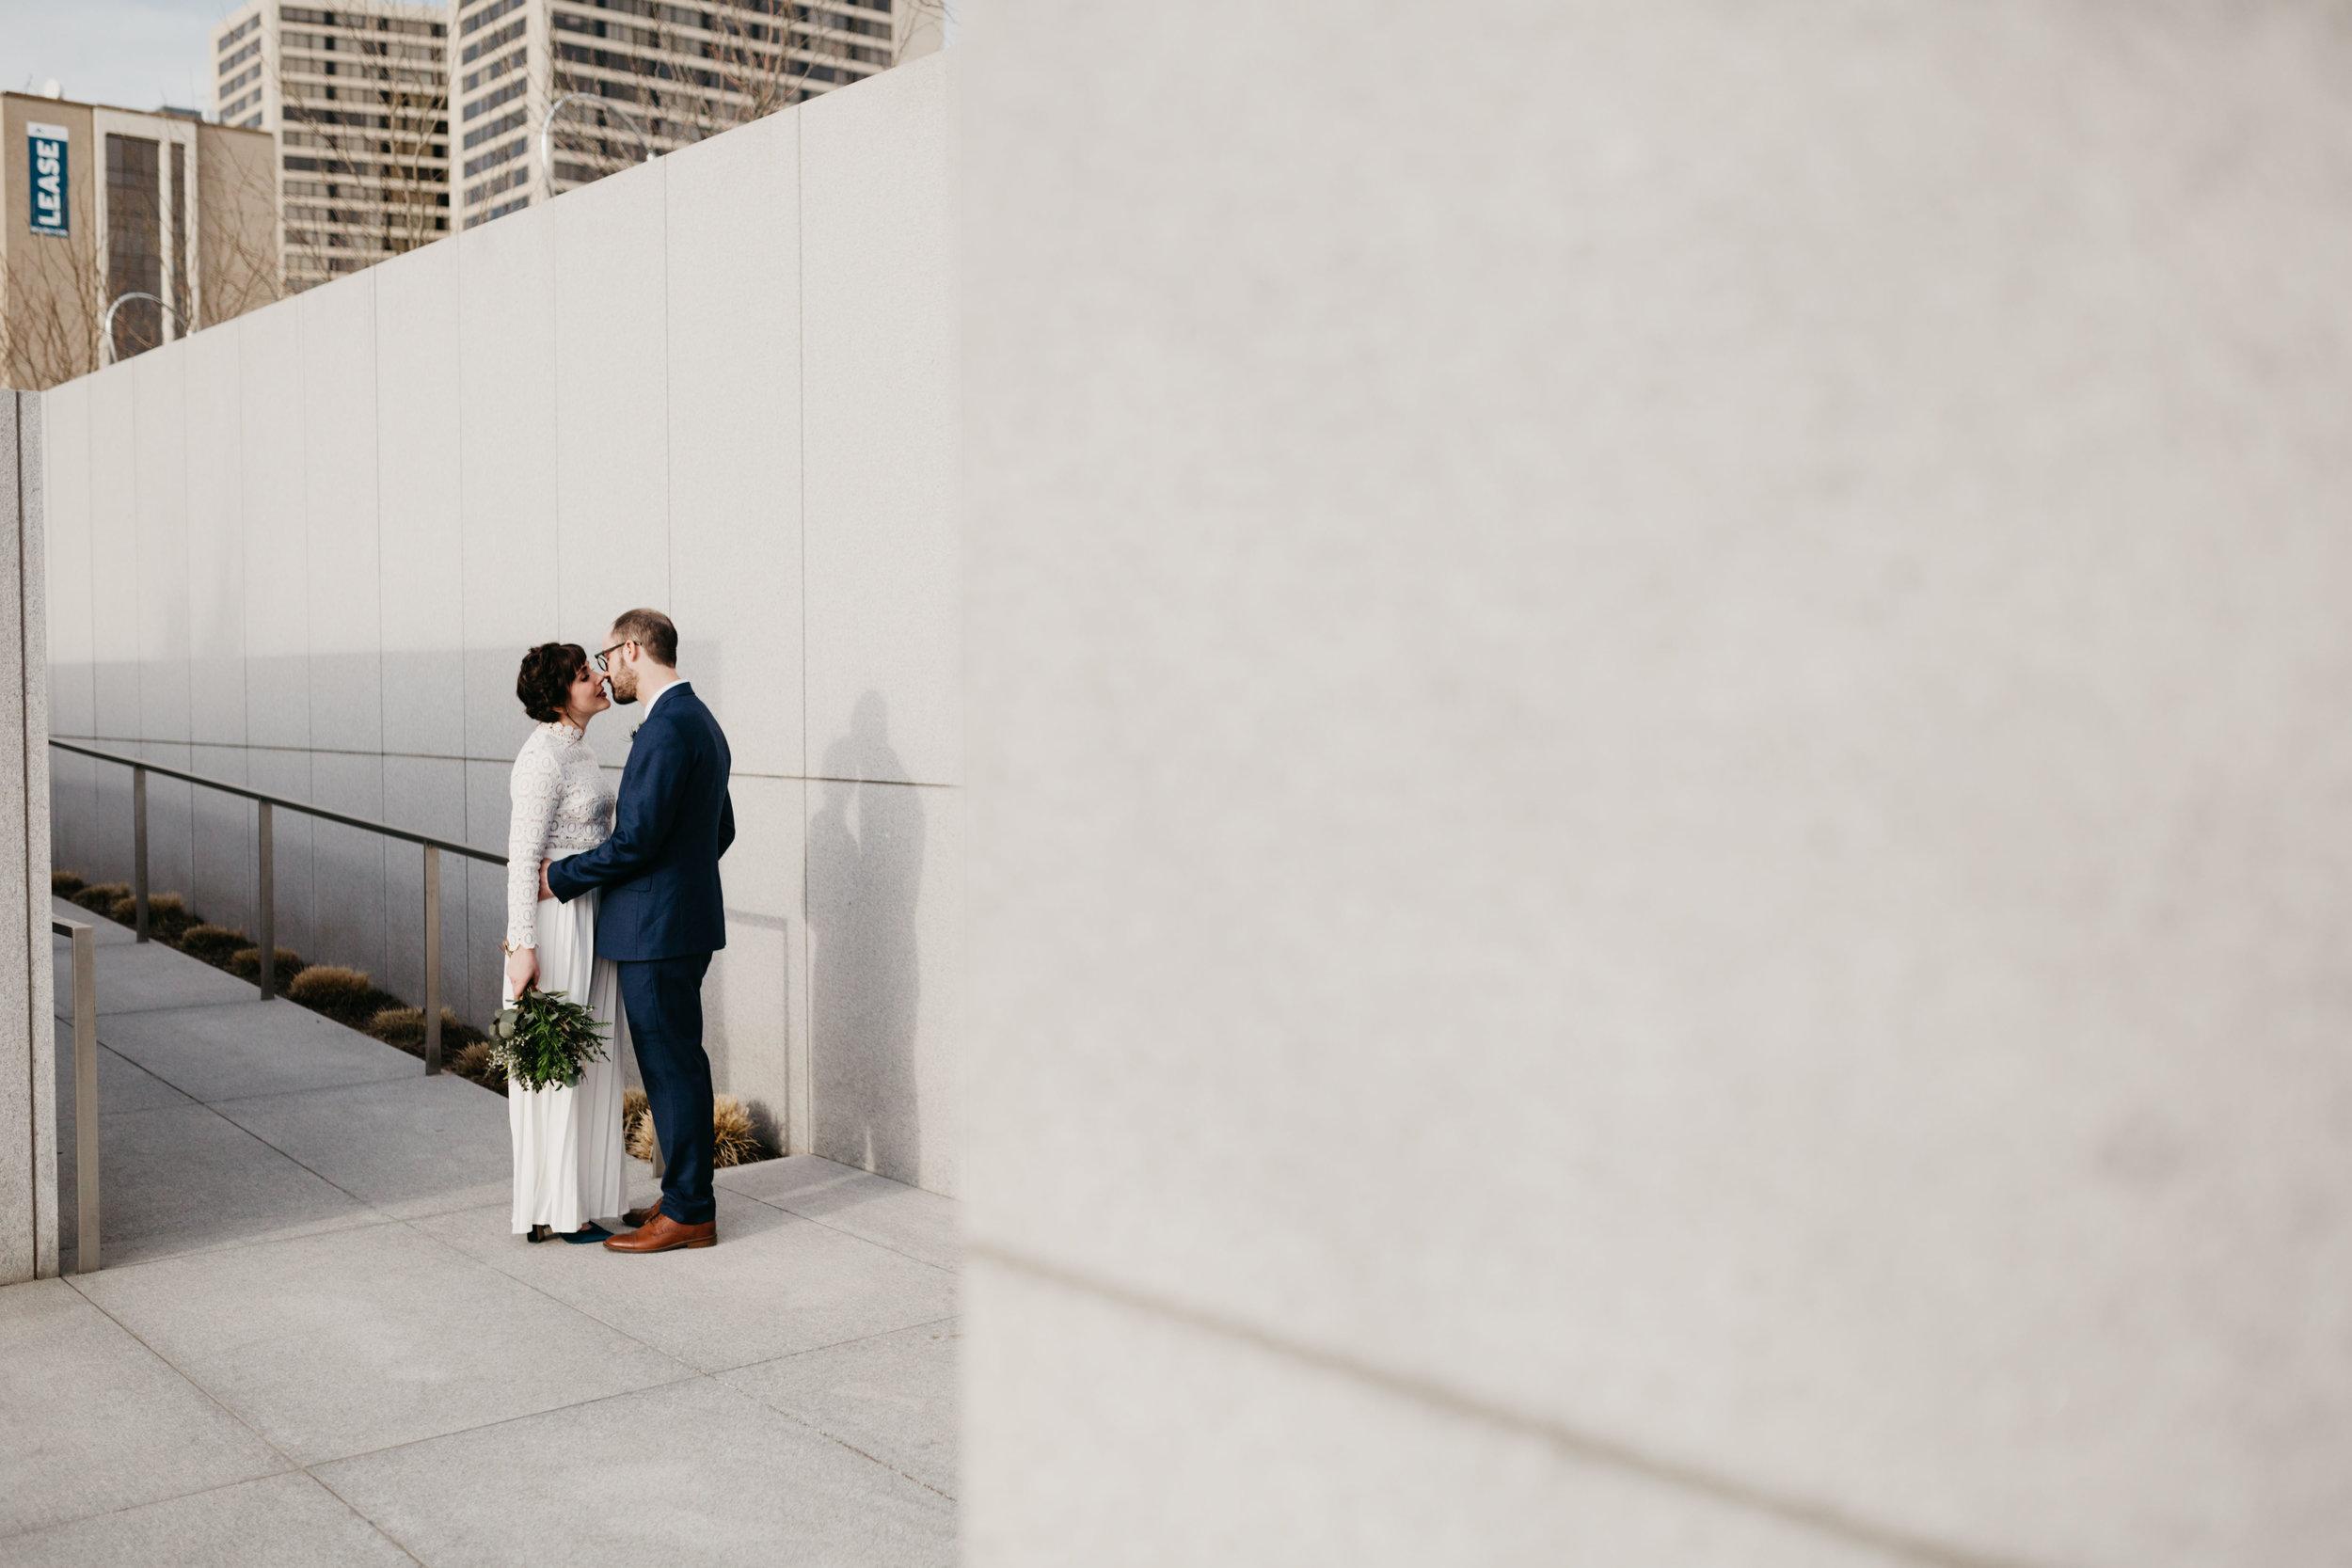 Utah-Wedding-Utah-Photographer-33.jpg